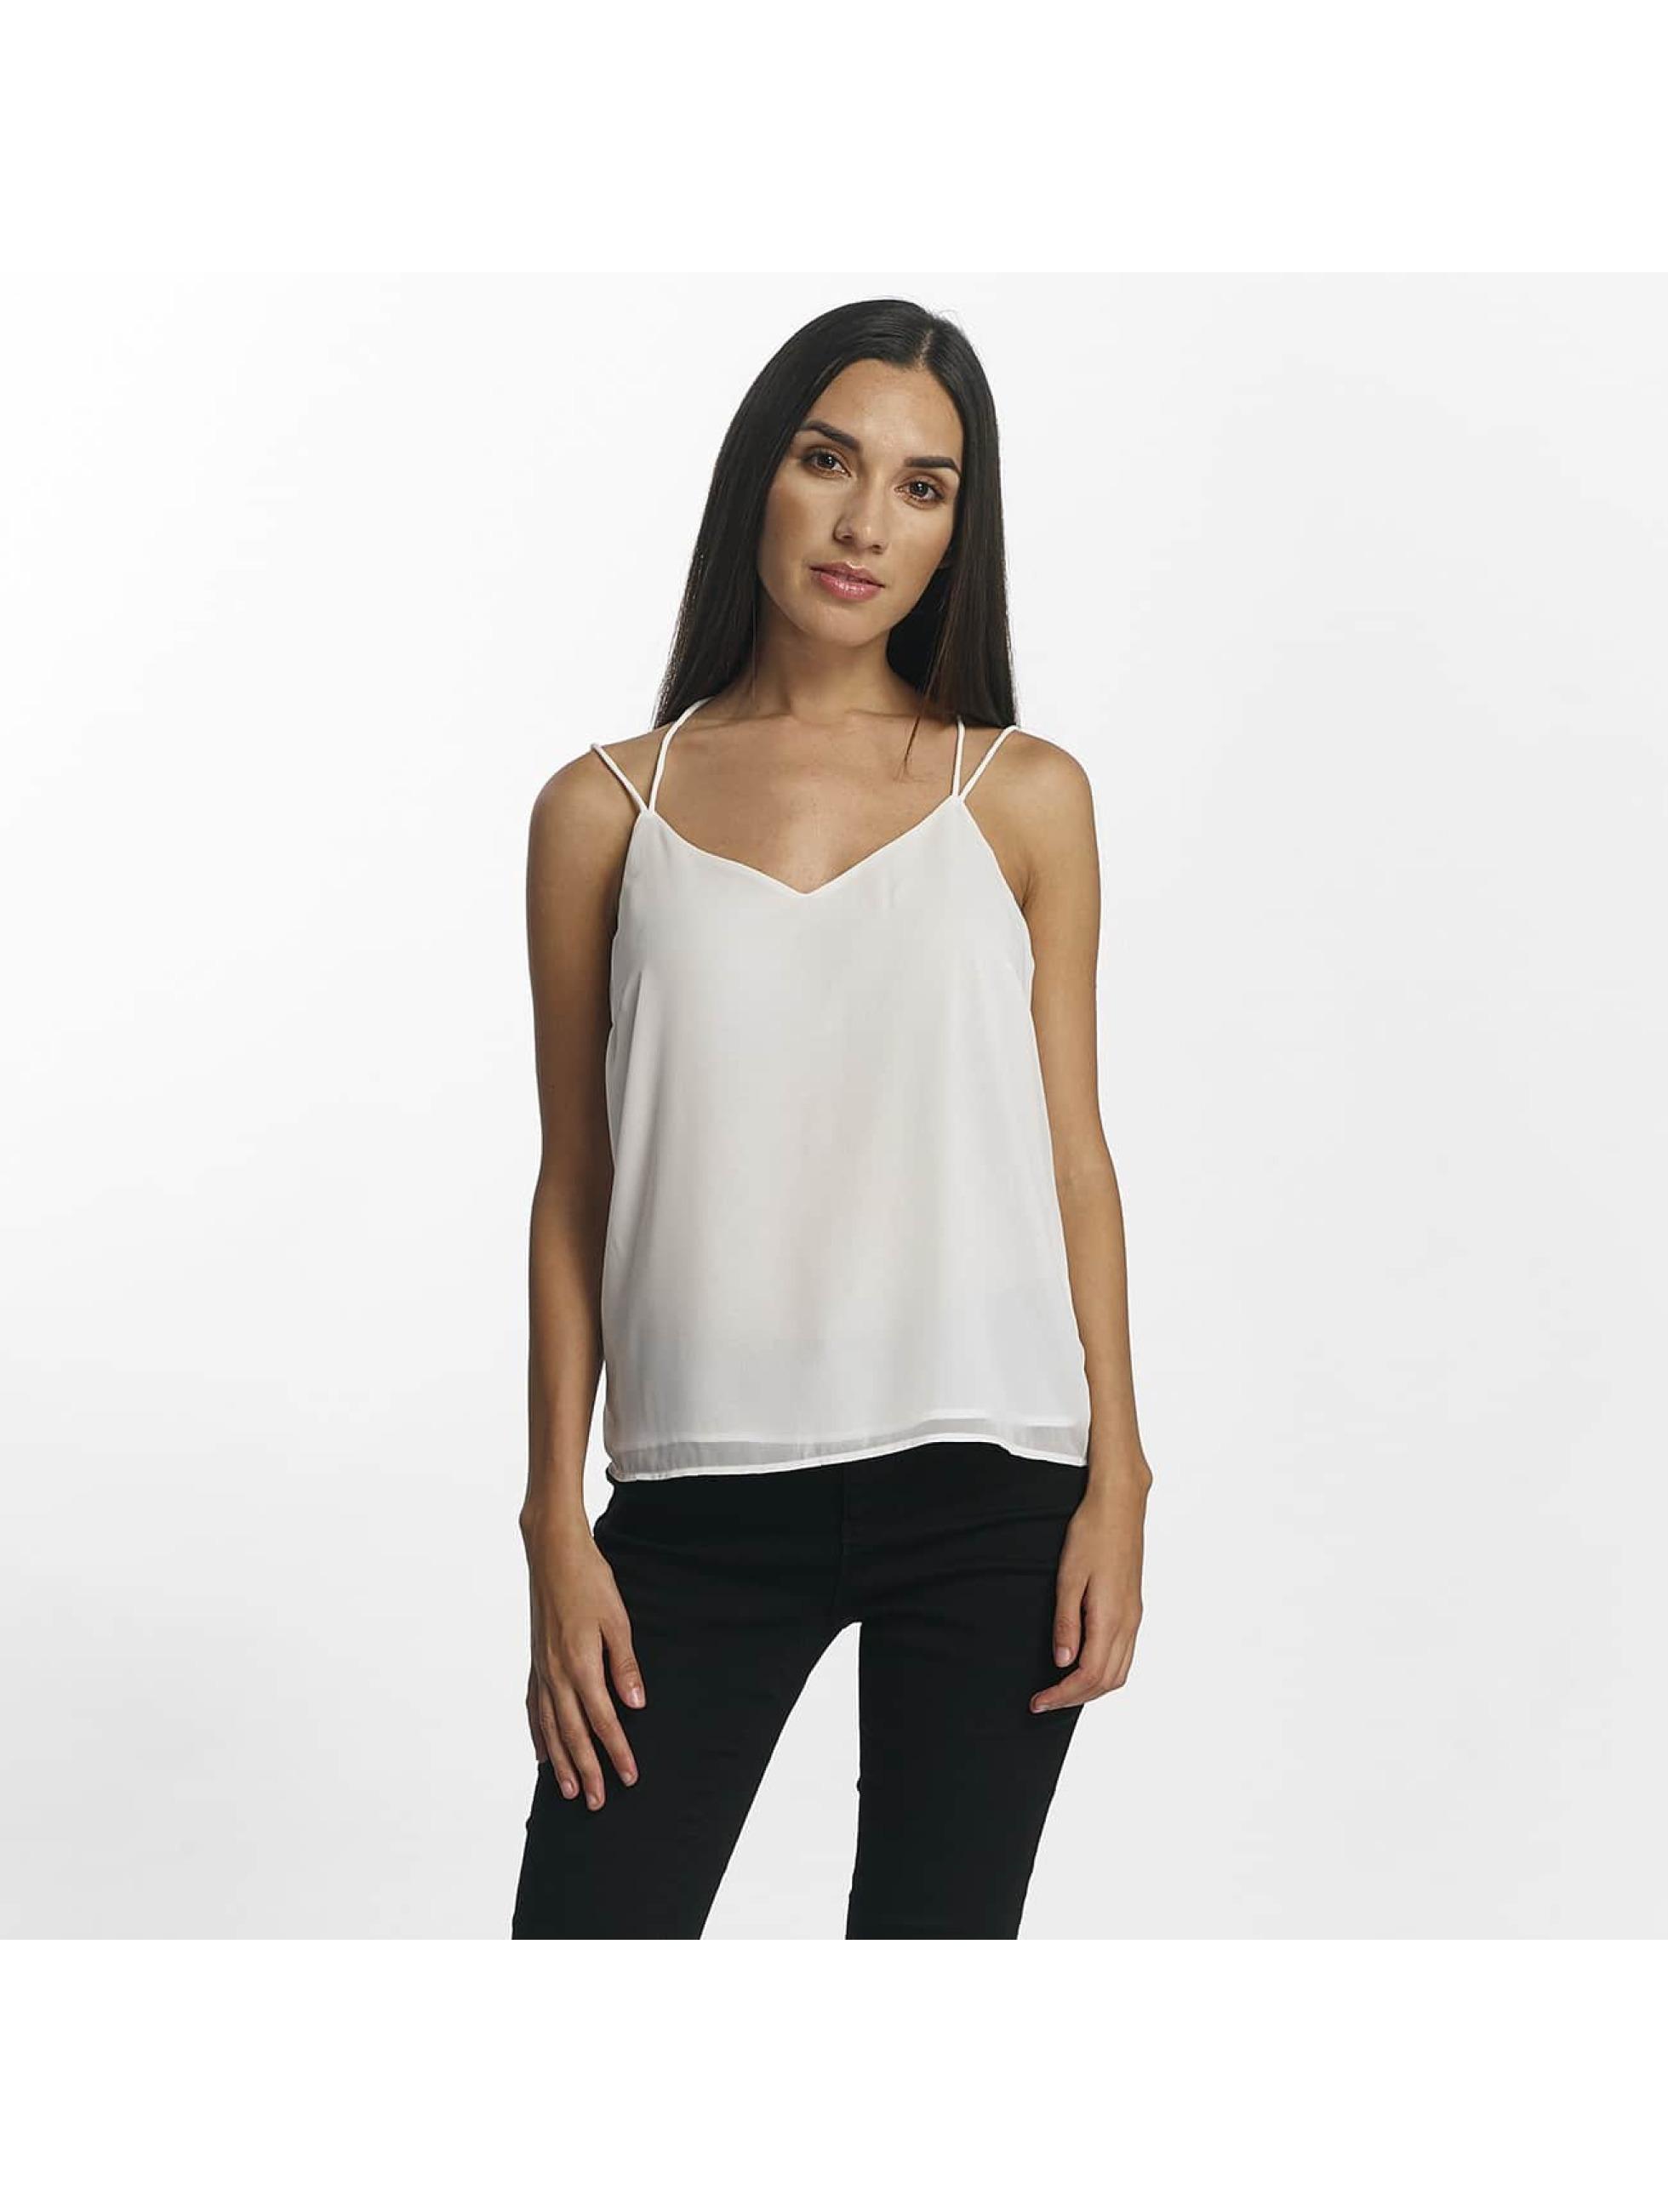 Vero Moda Frauen Top vmAmaze in weiß